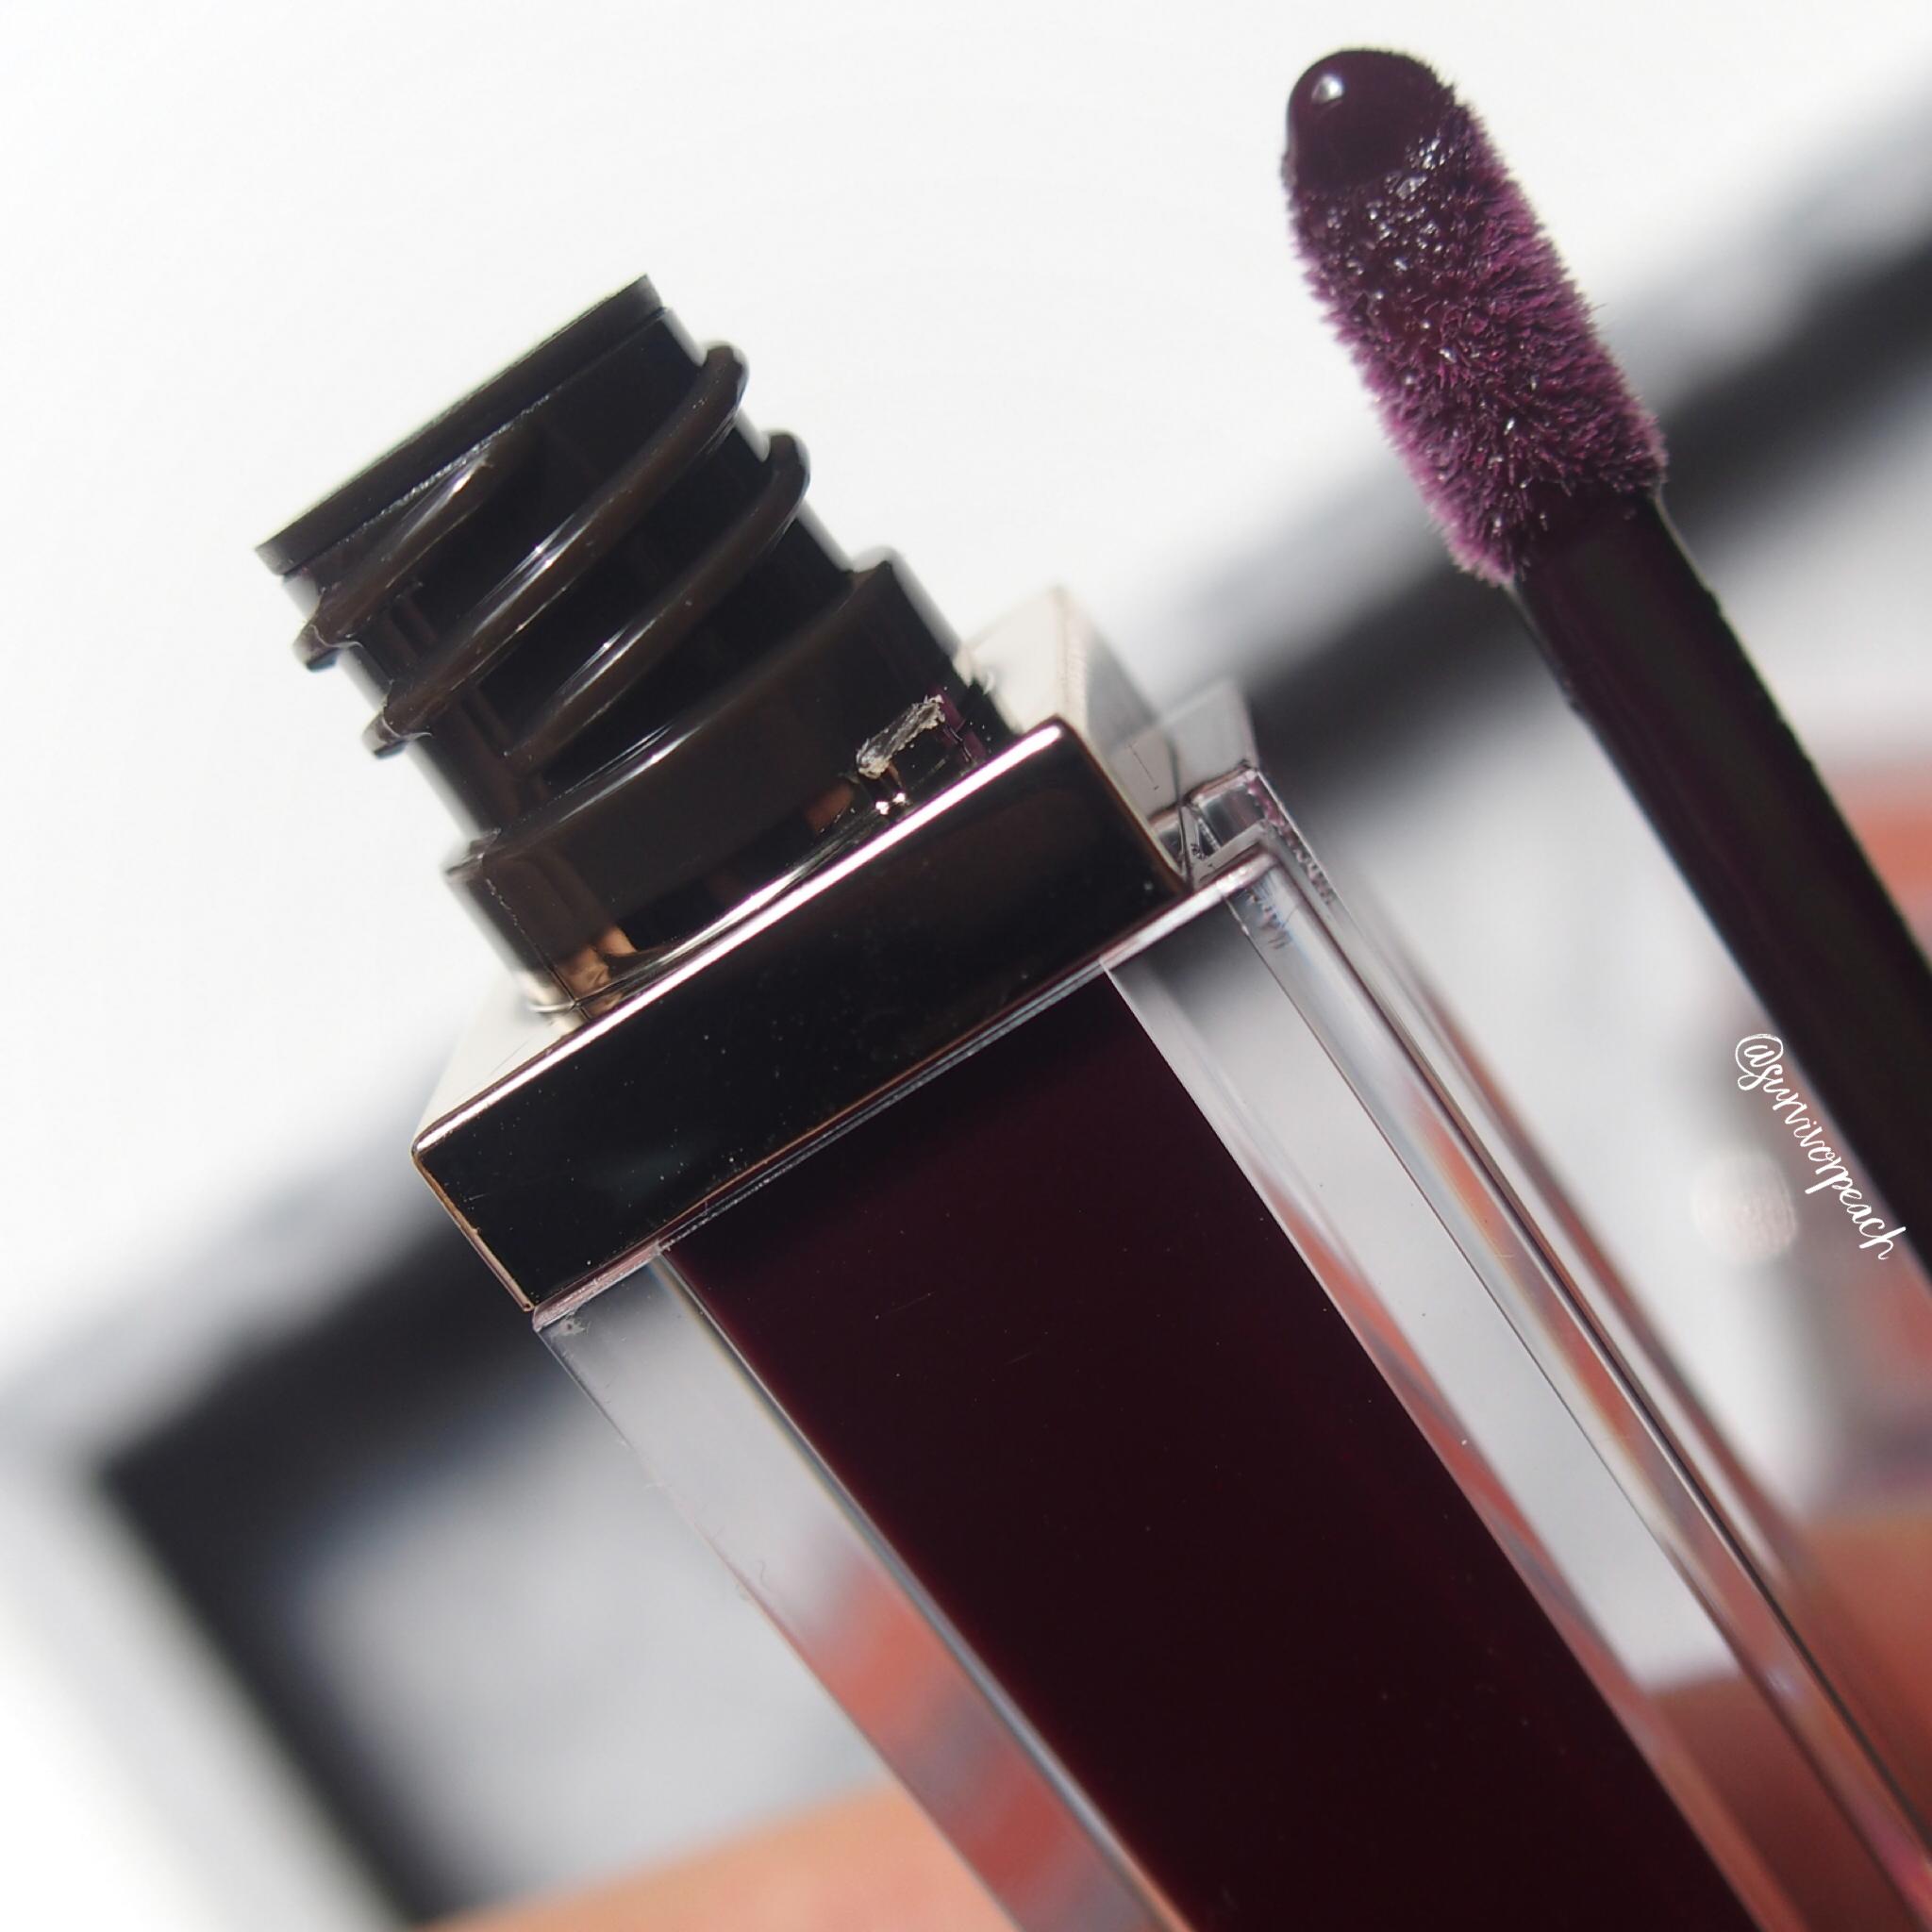 Jouer Sheer Pigment Lipgloss in shades Via Condotti.